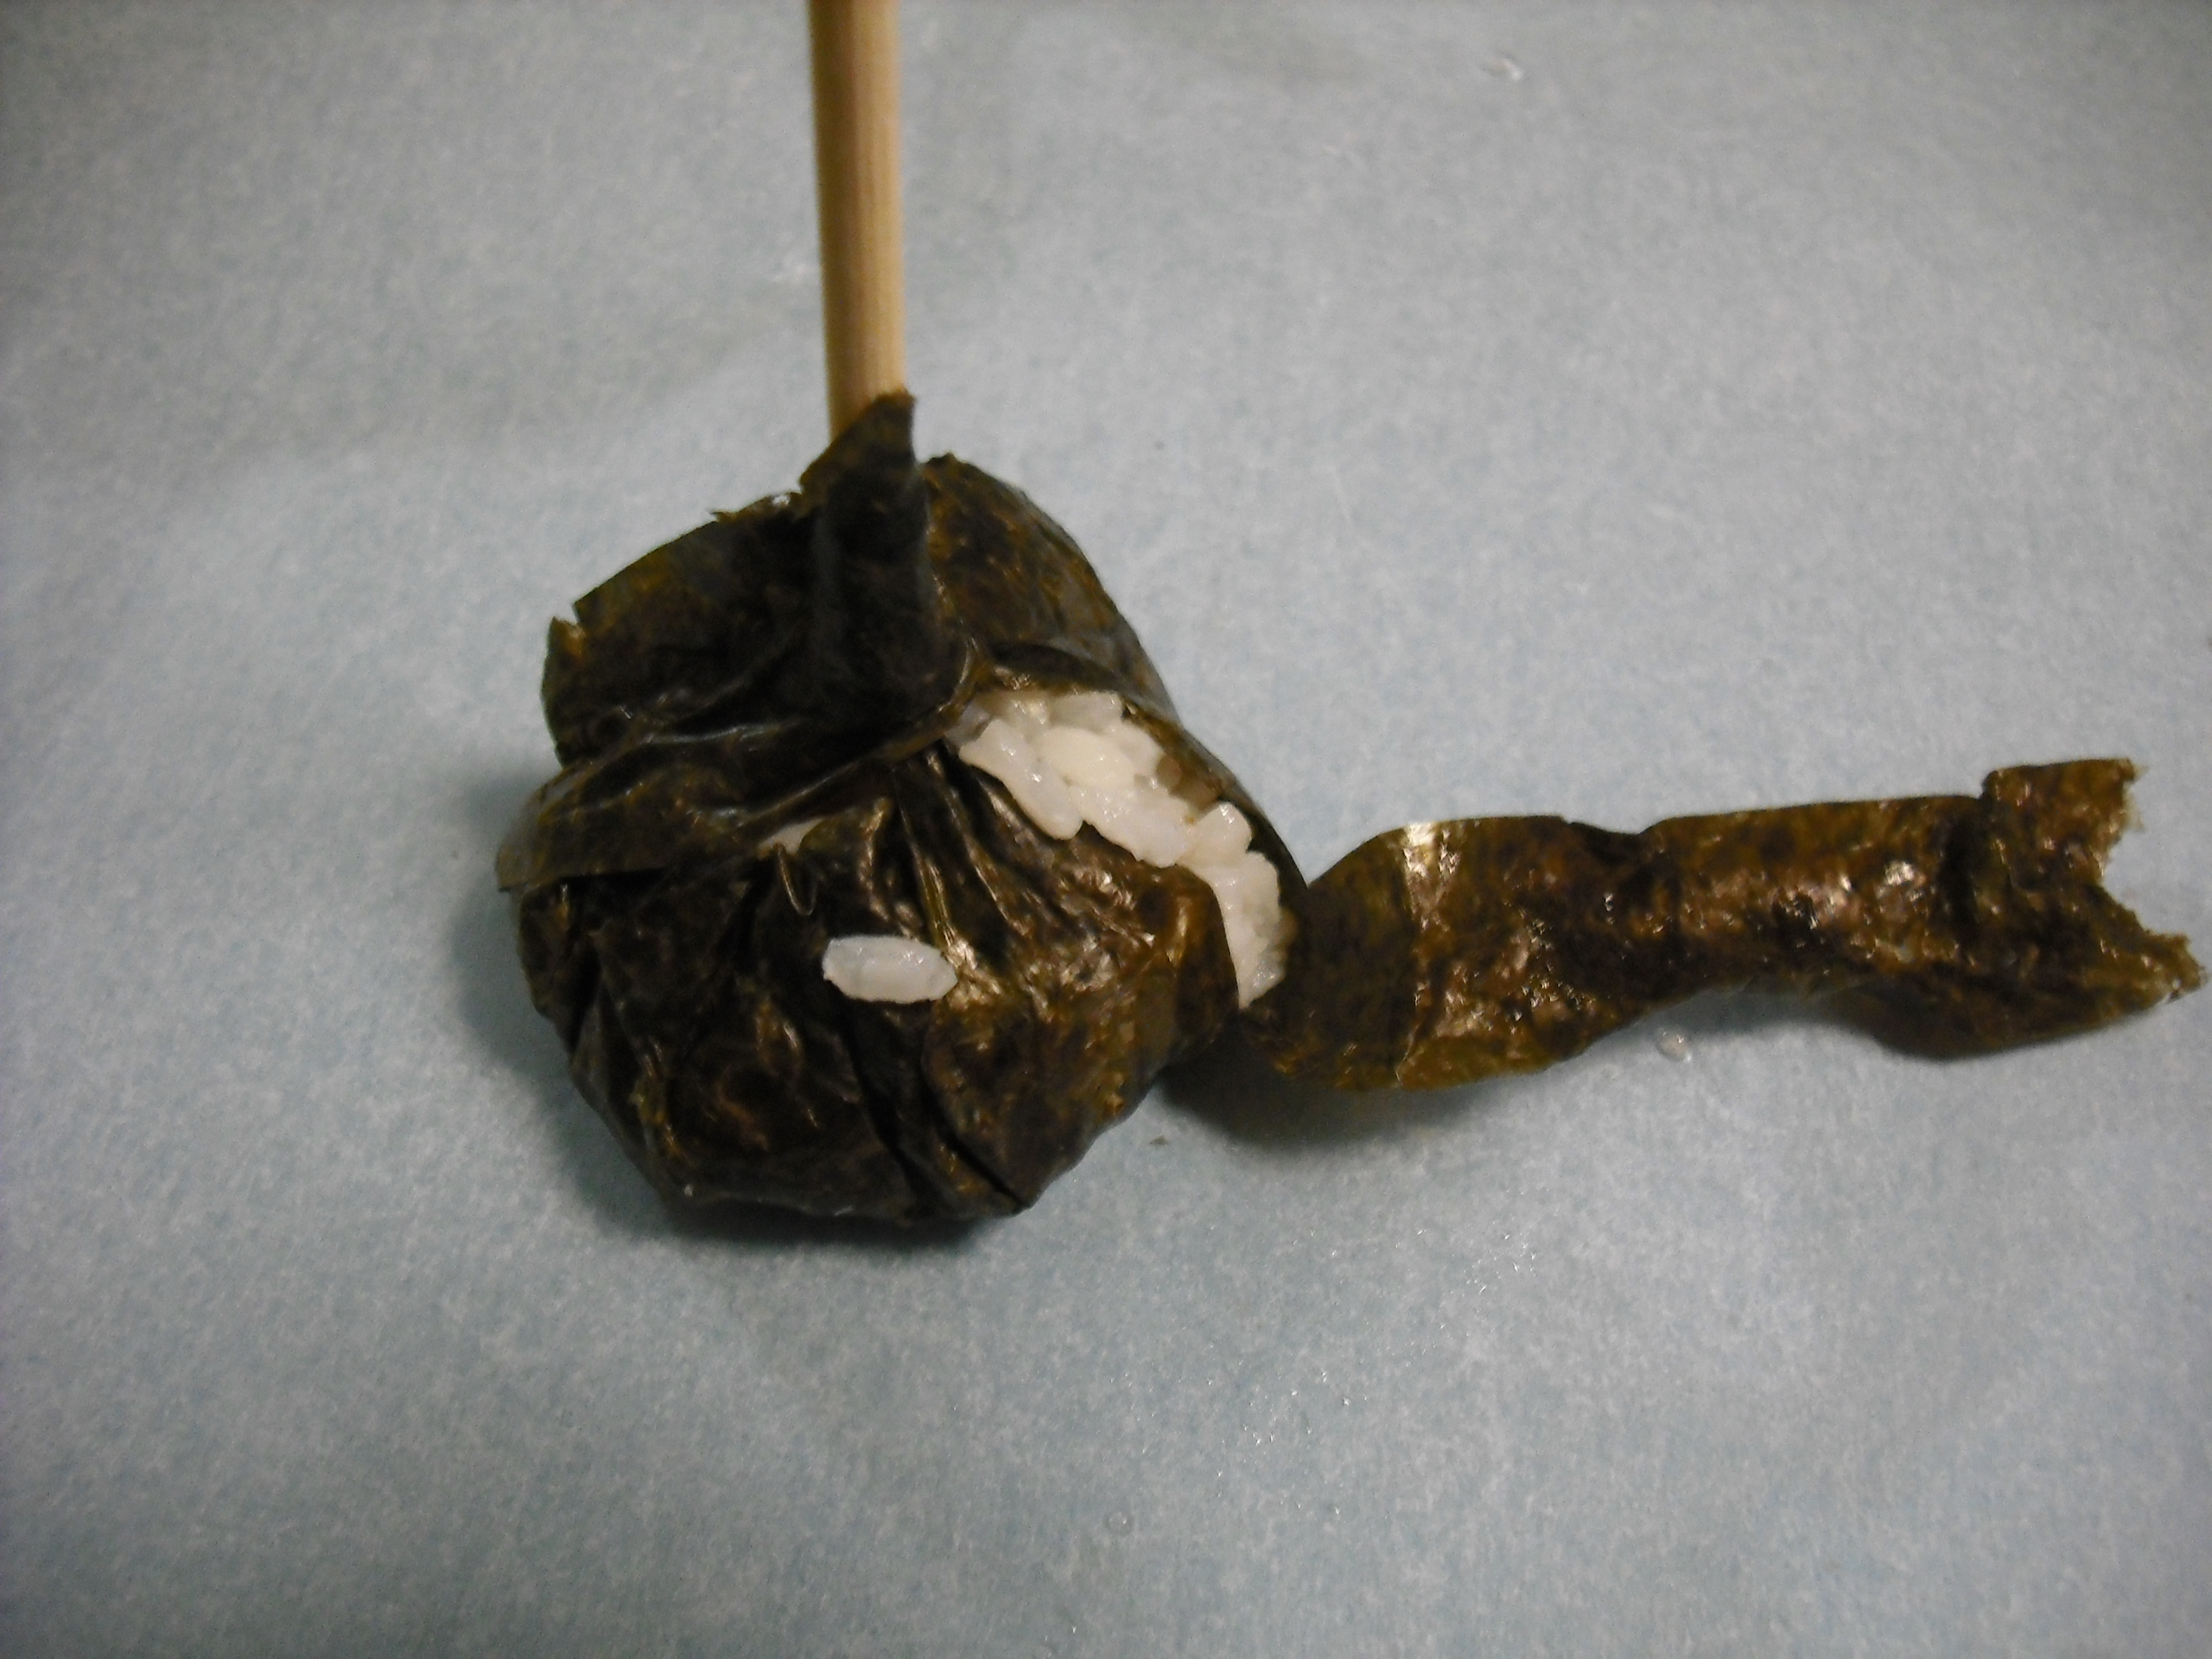 Picture of Second Method: Nori Pop